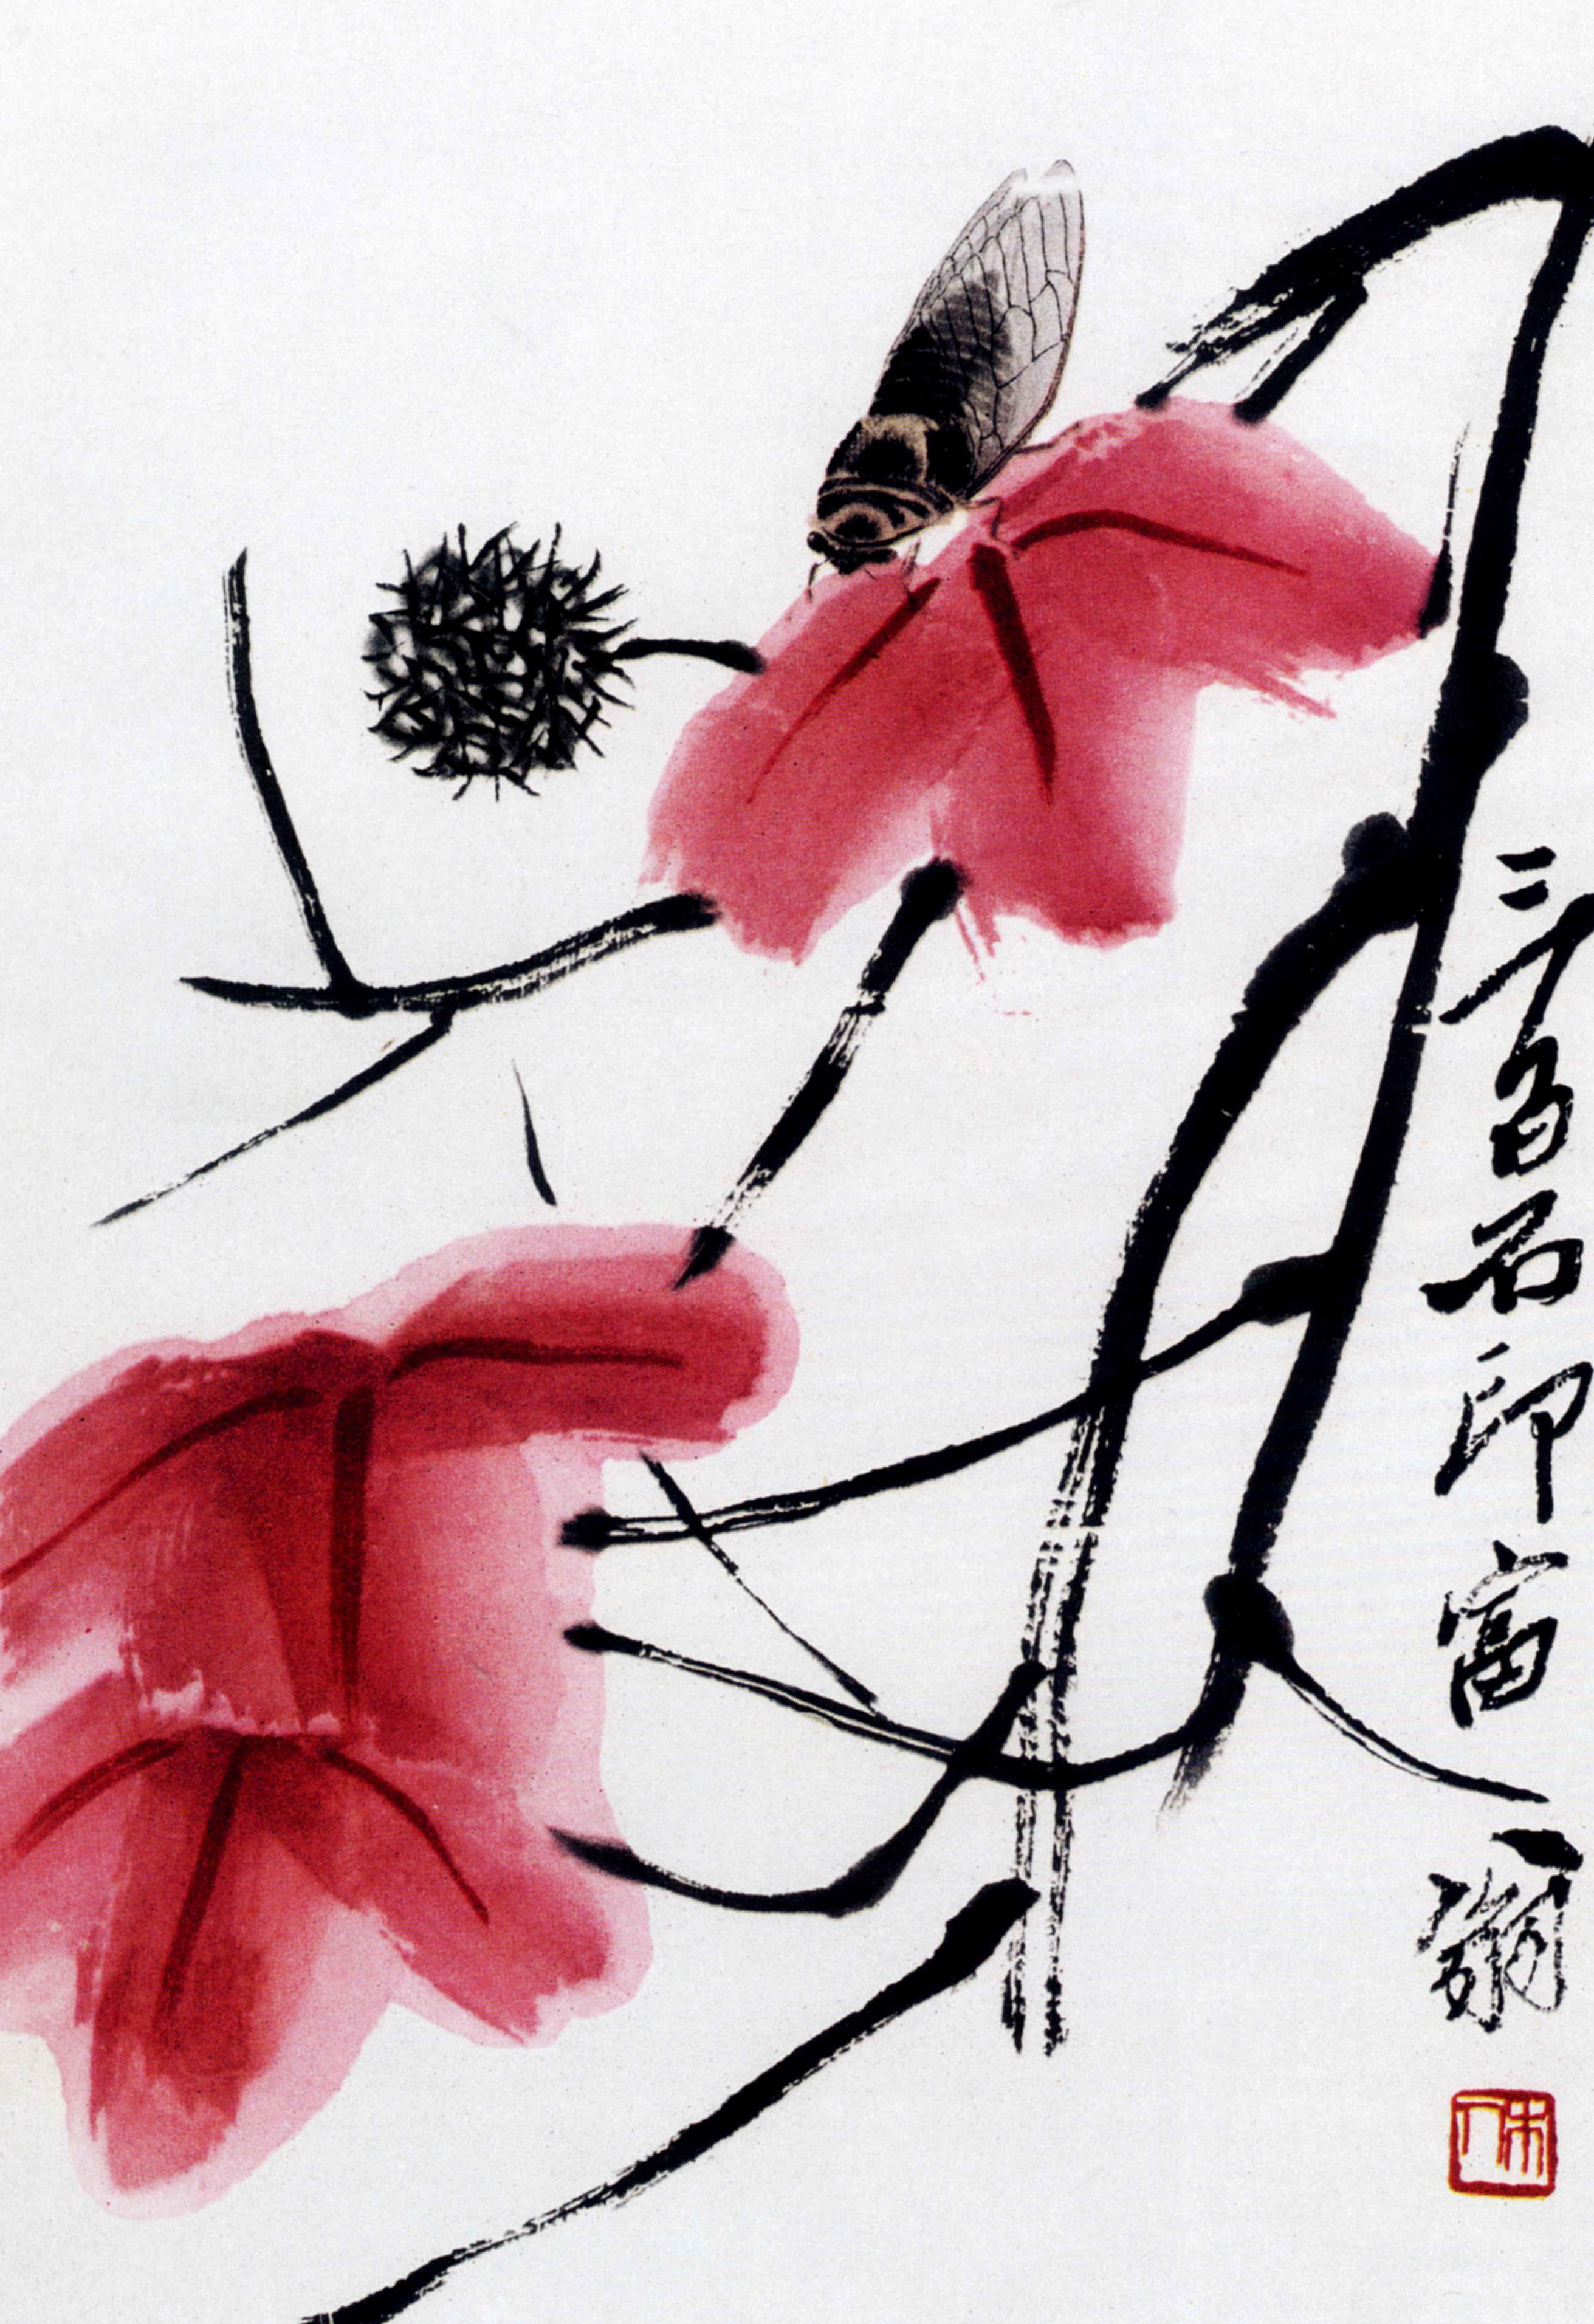 Китайская пейзажная живопись. Ци Байши. «Осенняя цикада на цветках лапины»